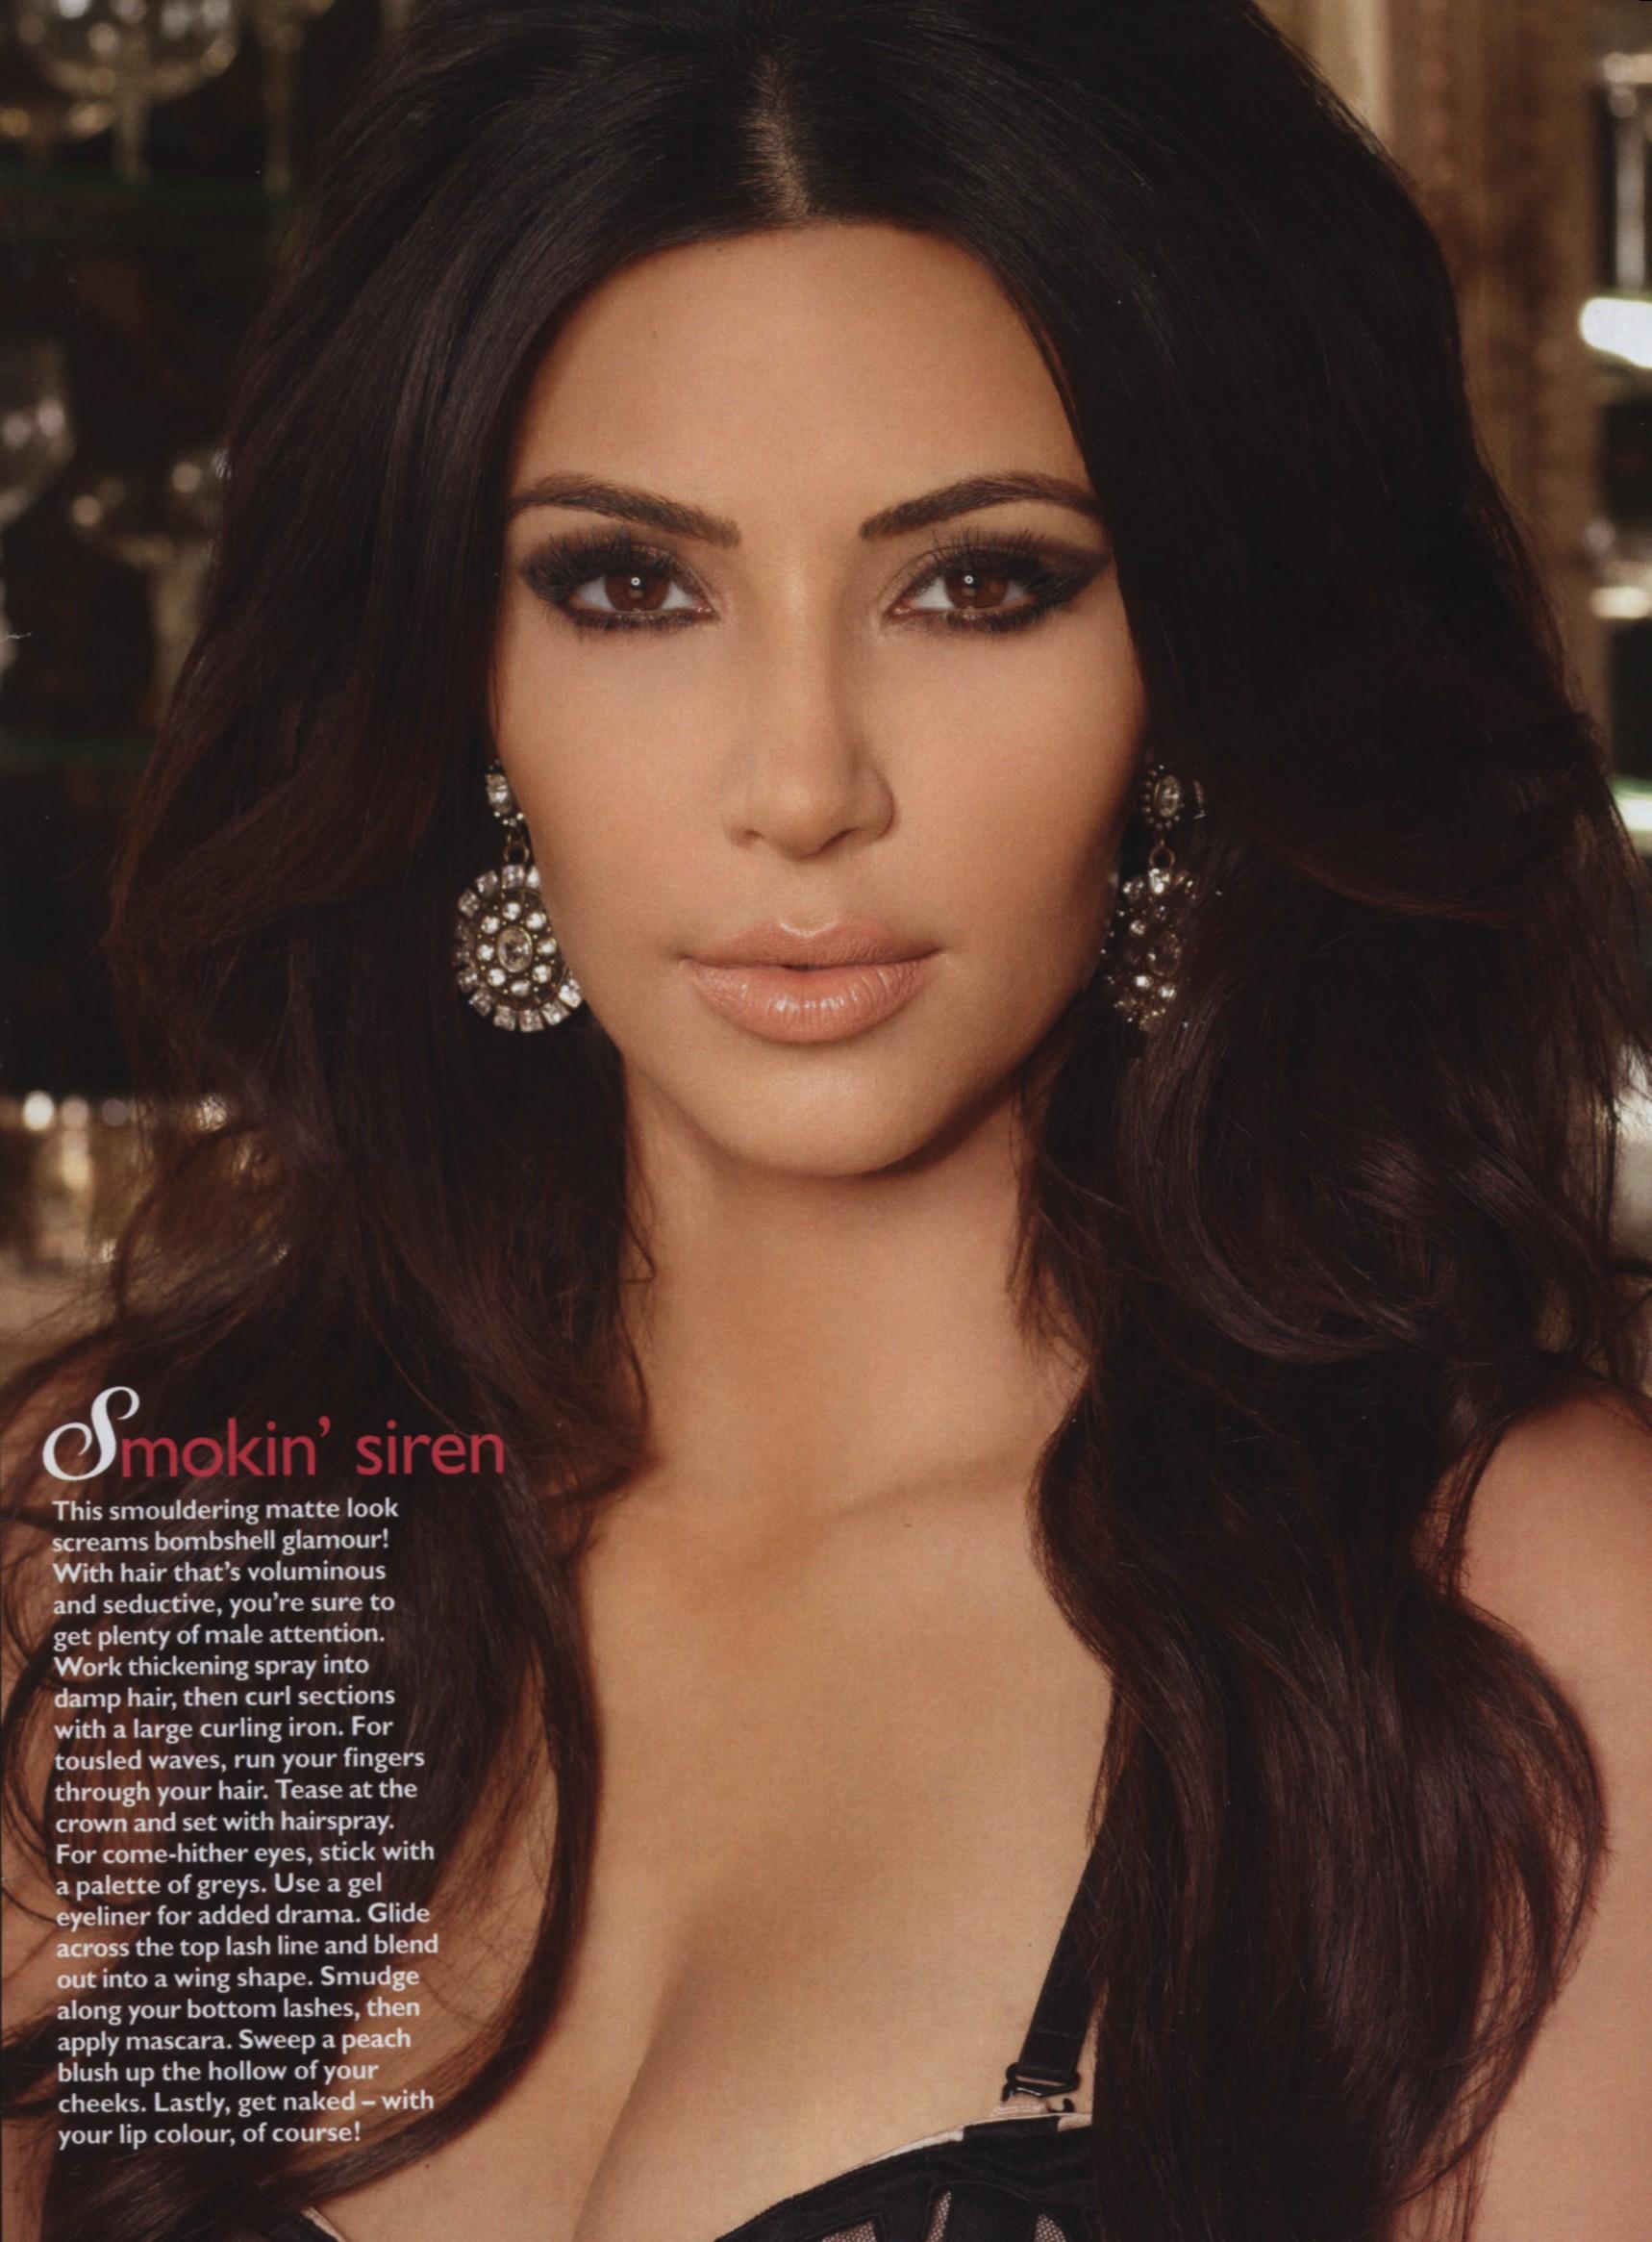 Kim Kardashian Cosmo Magazine Australian June 2011 03